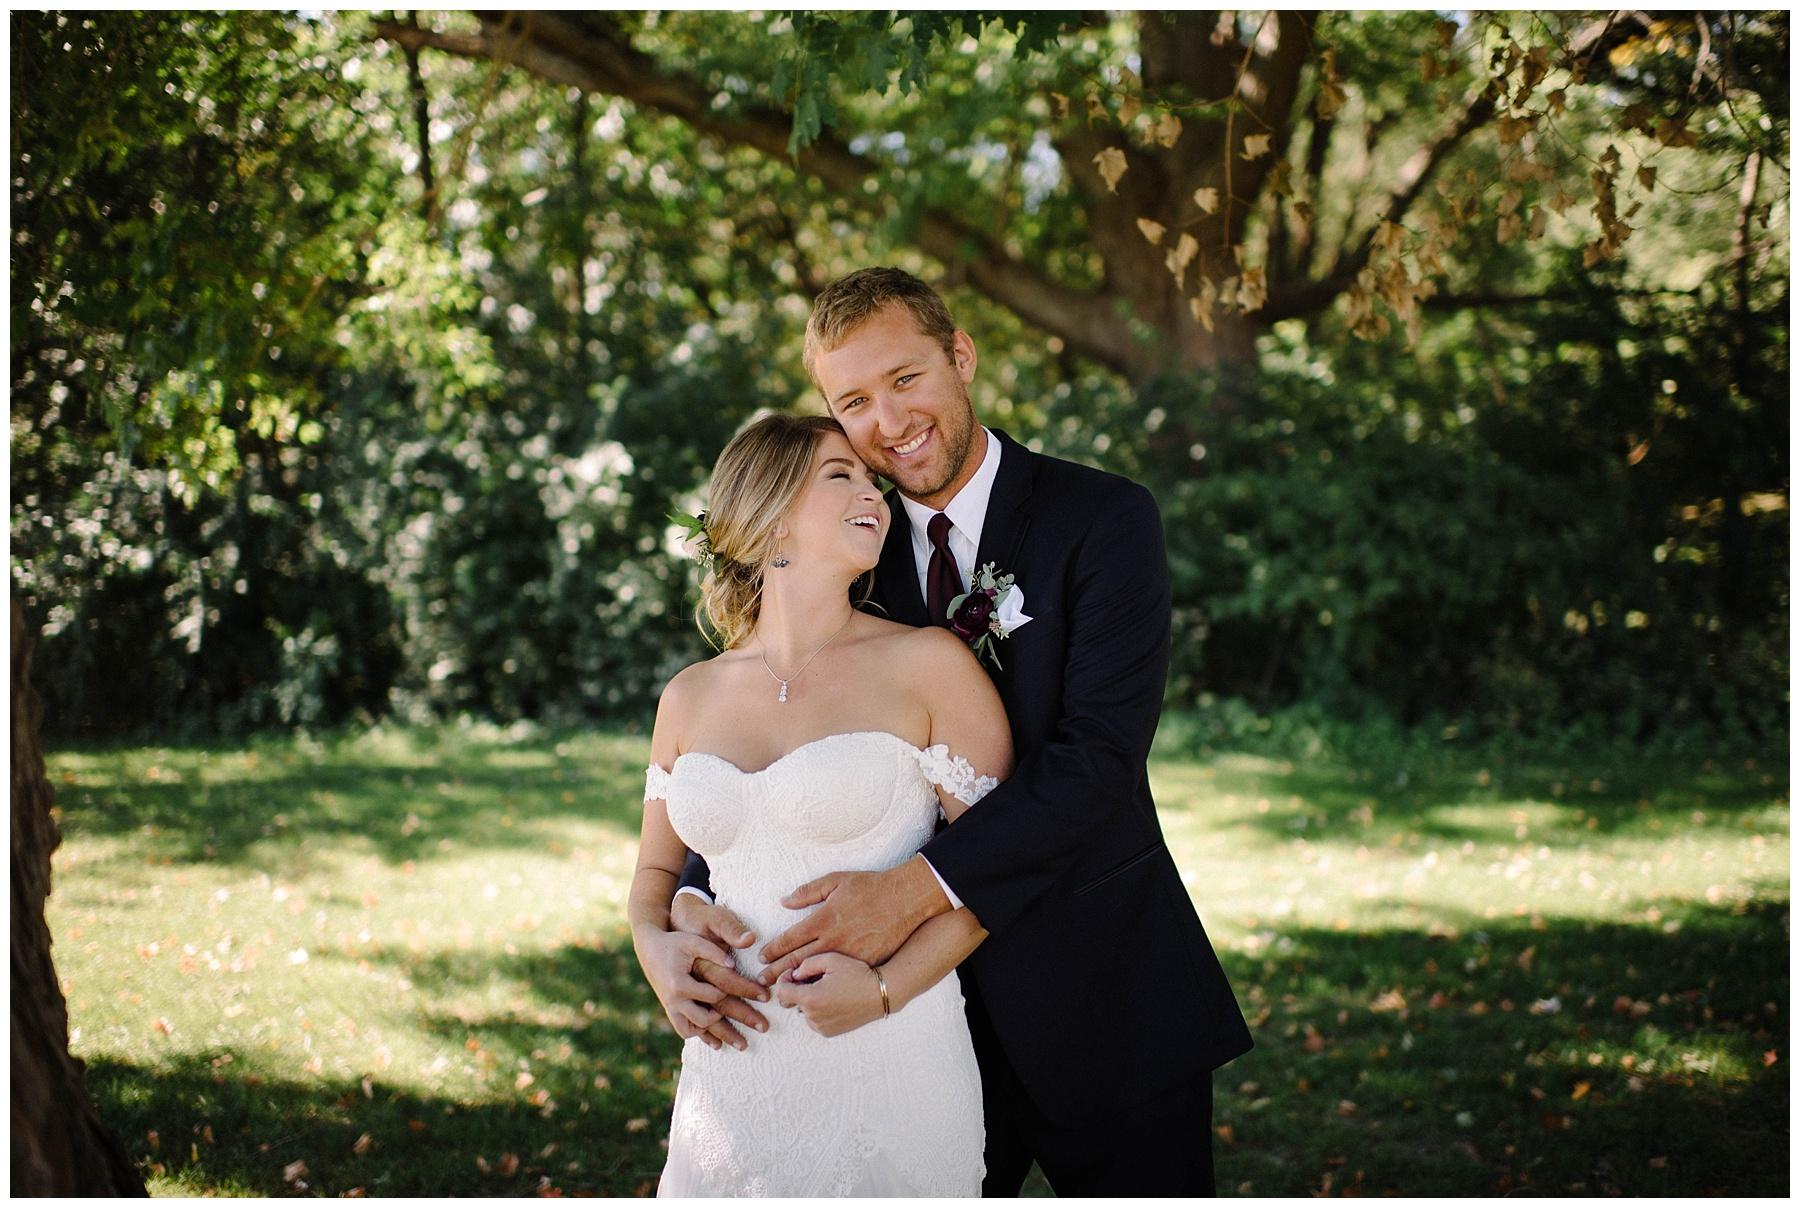 Kyle + Devyn Udendørs sommerbryllup Lauren F.otography  Outdoor summer wedding Lauren F.otography